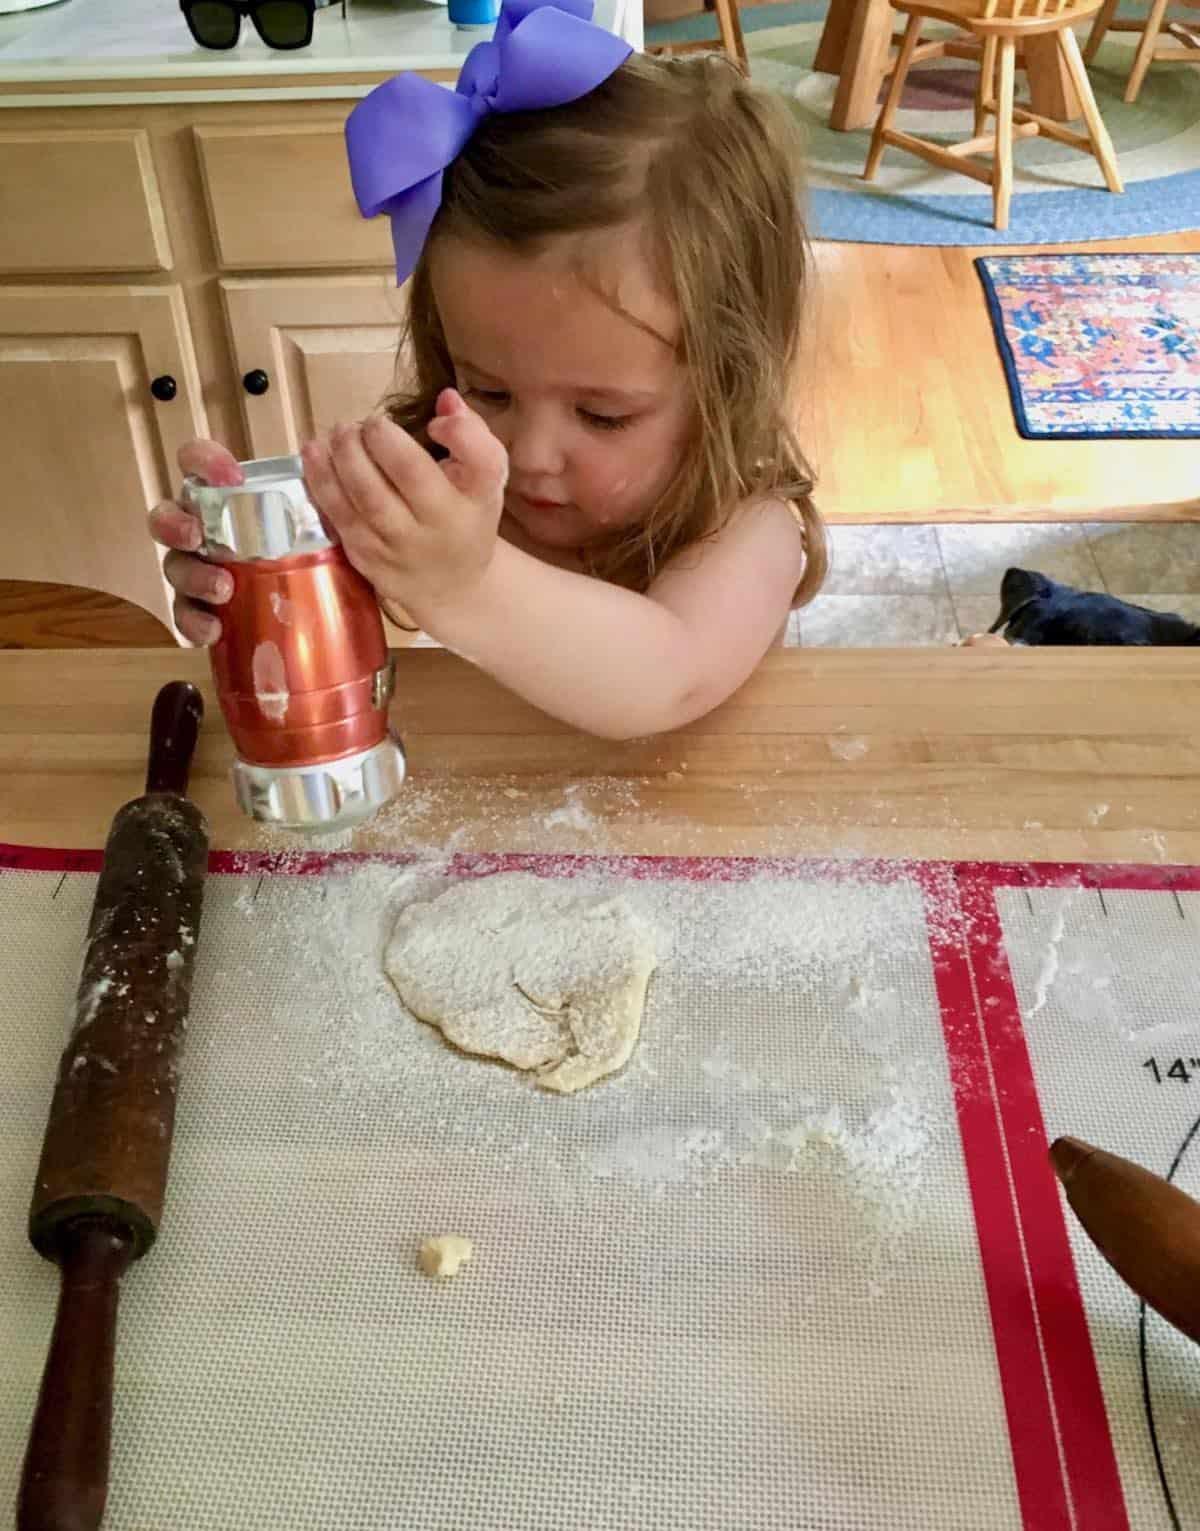 grand daughter rolling pie dough